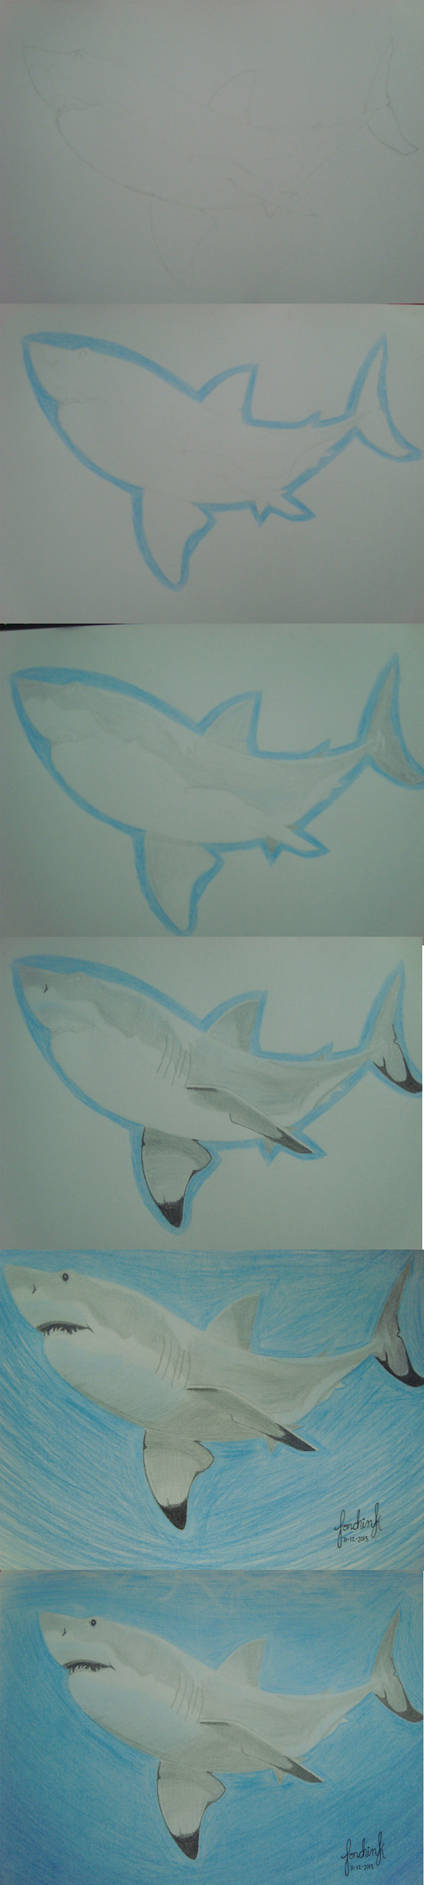 Step To Step Shark